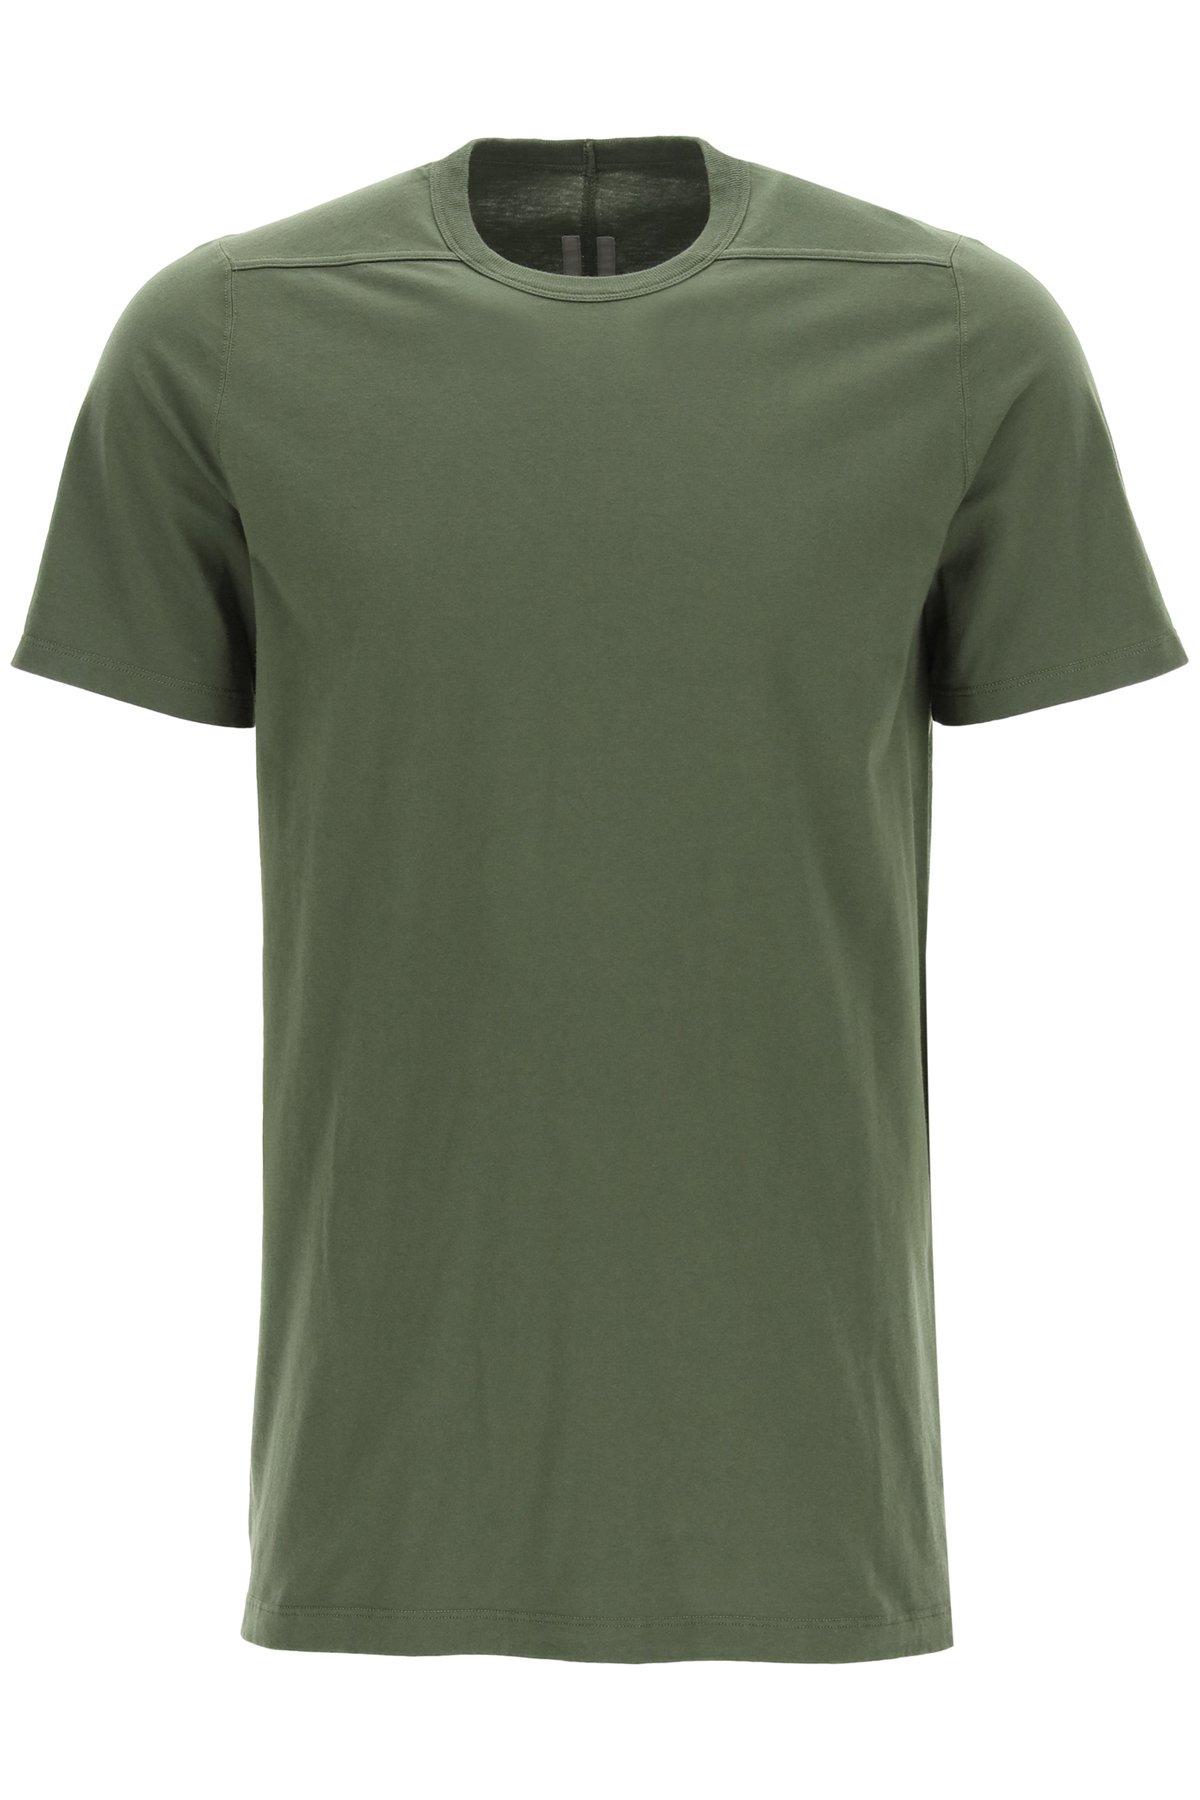 Rick owens t-shirt level t gethsemane